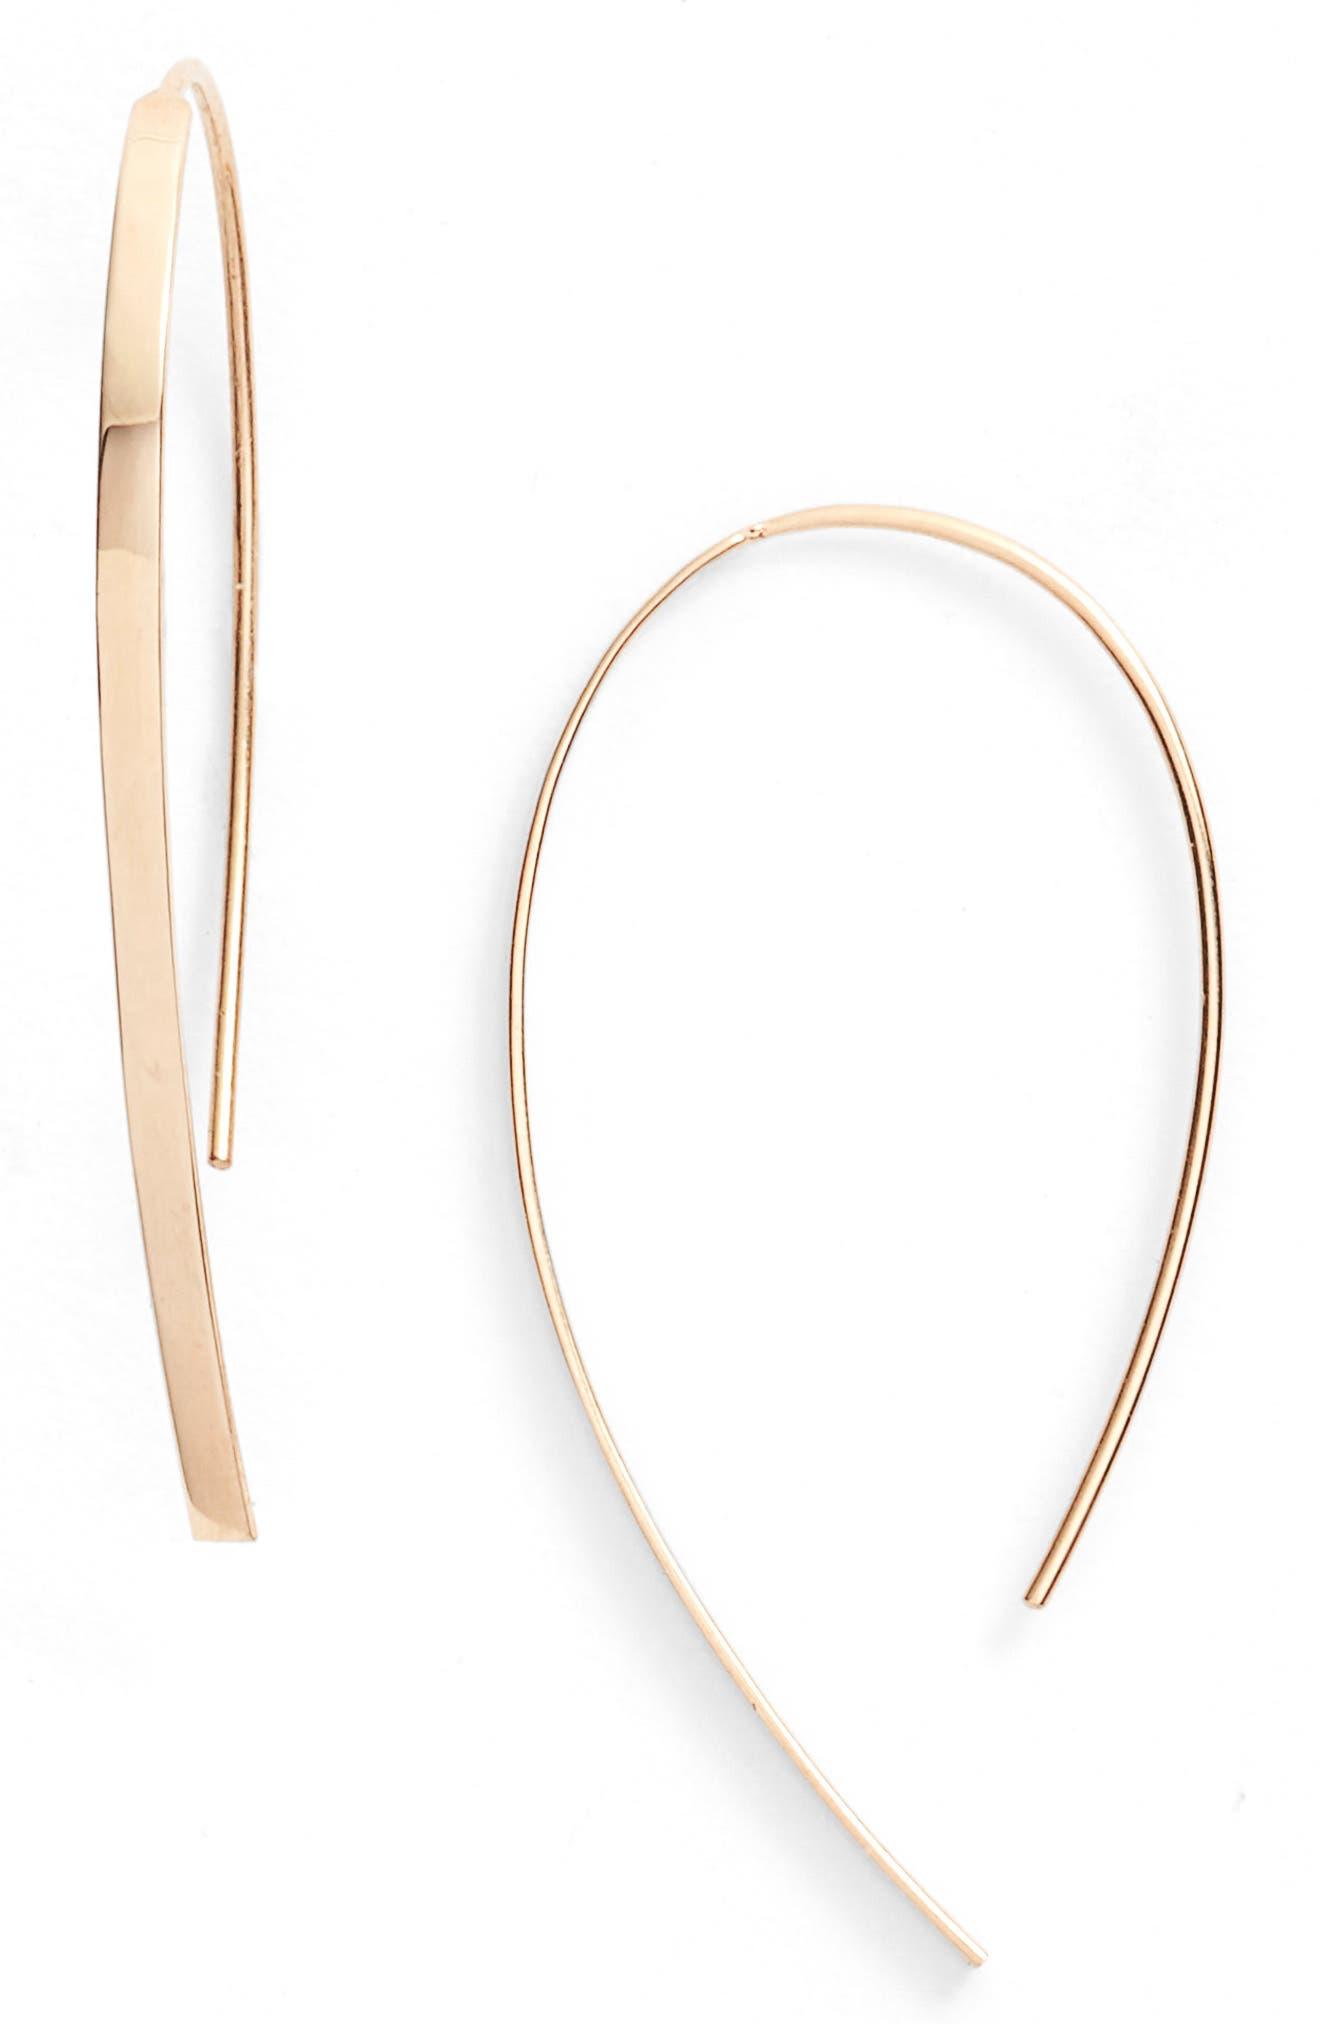 Alternate Image 1 Selected - Lana Jewelry Mini Flat Hooked On Hoop Earrings